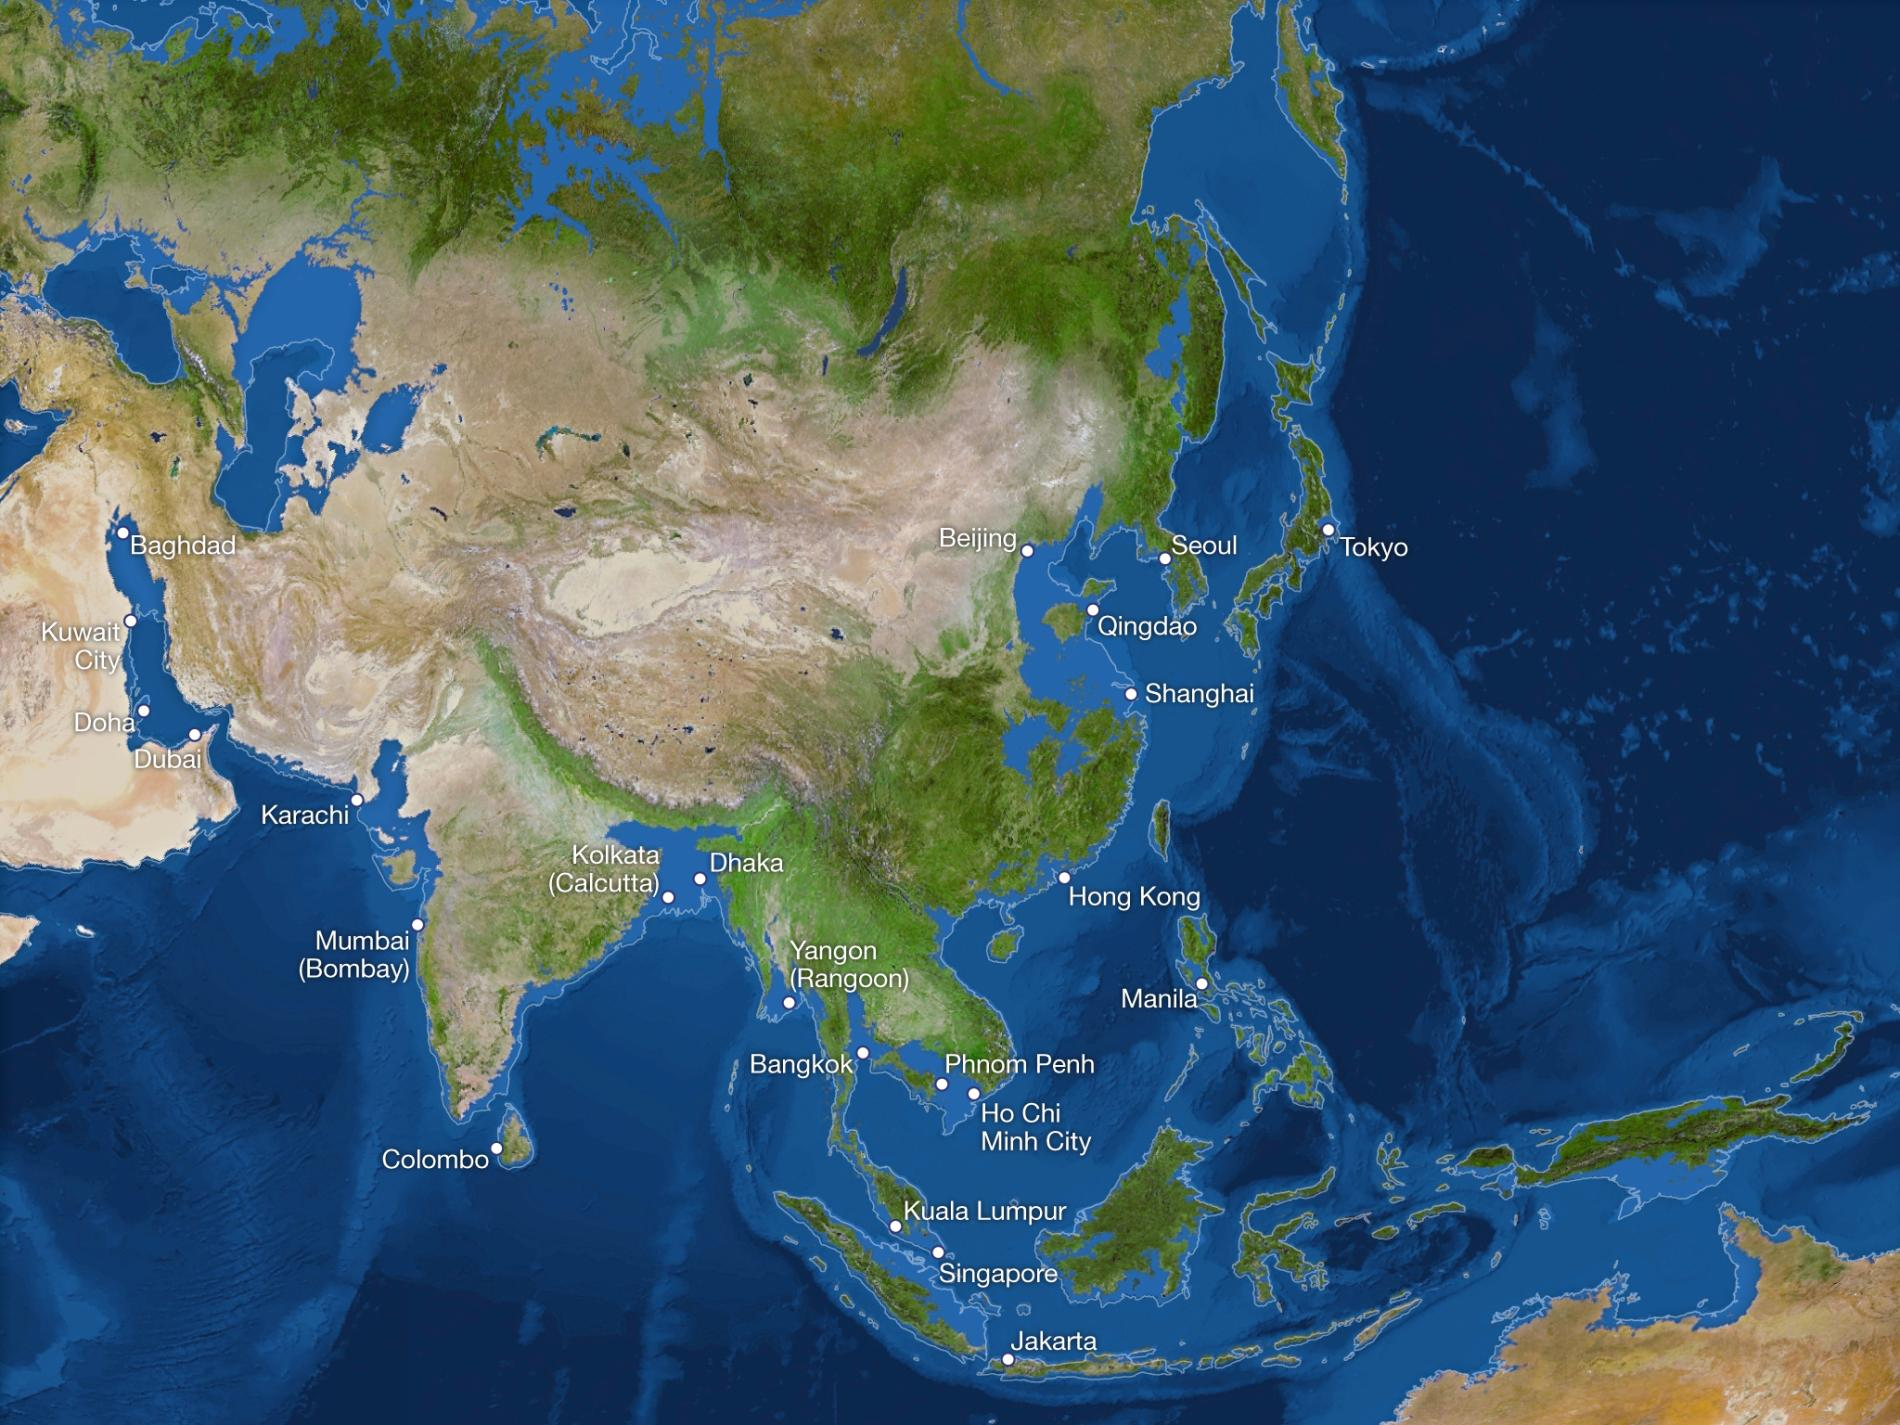 05-ice-melt-asia.adapt.1900.1